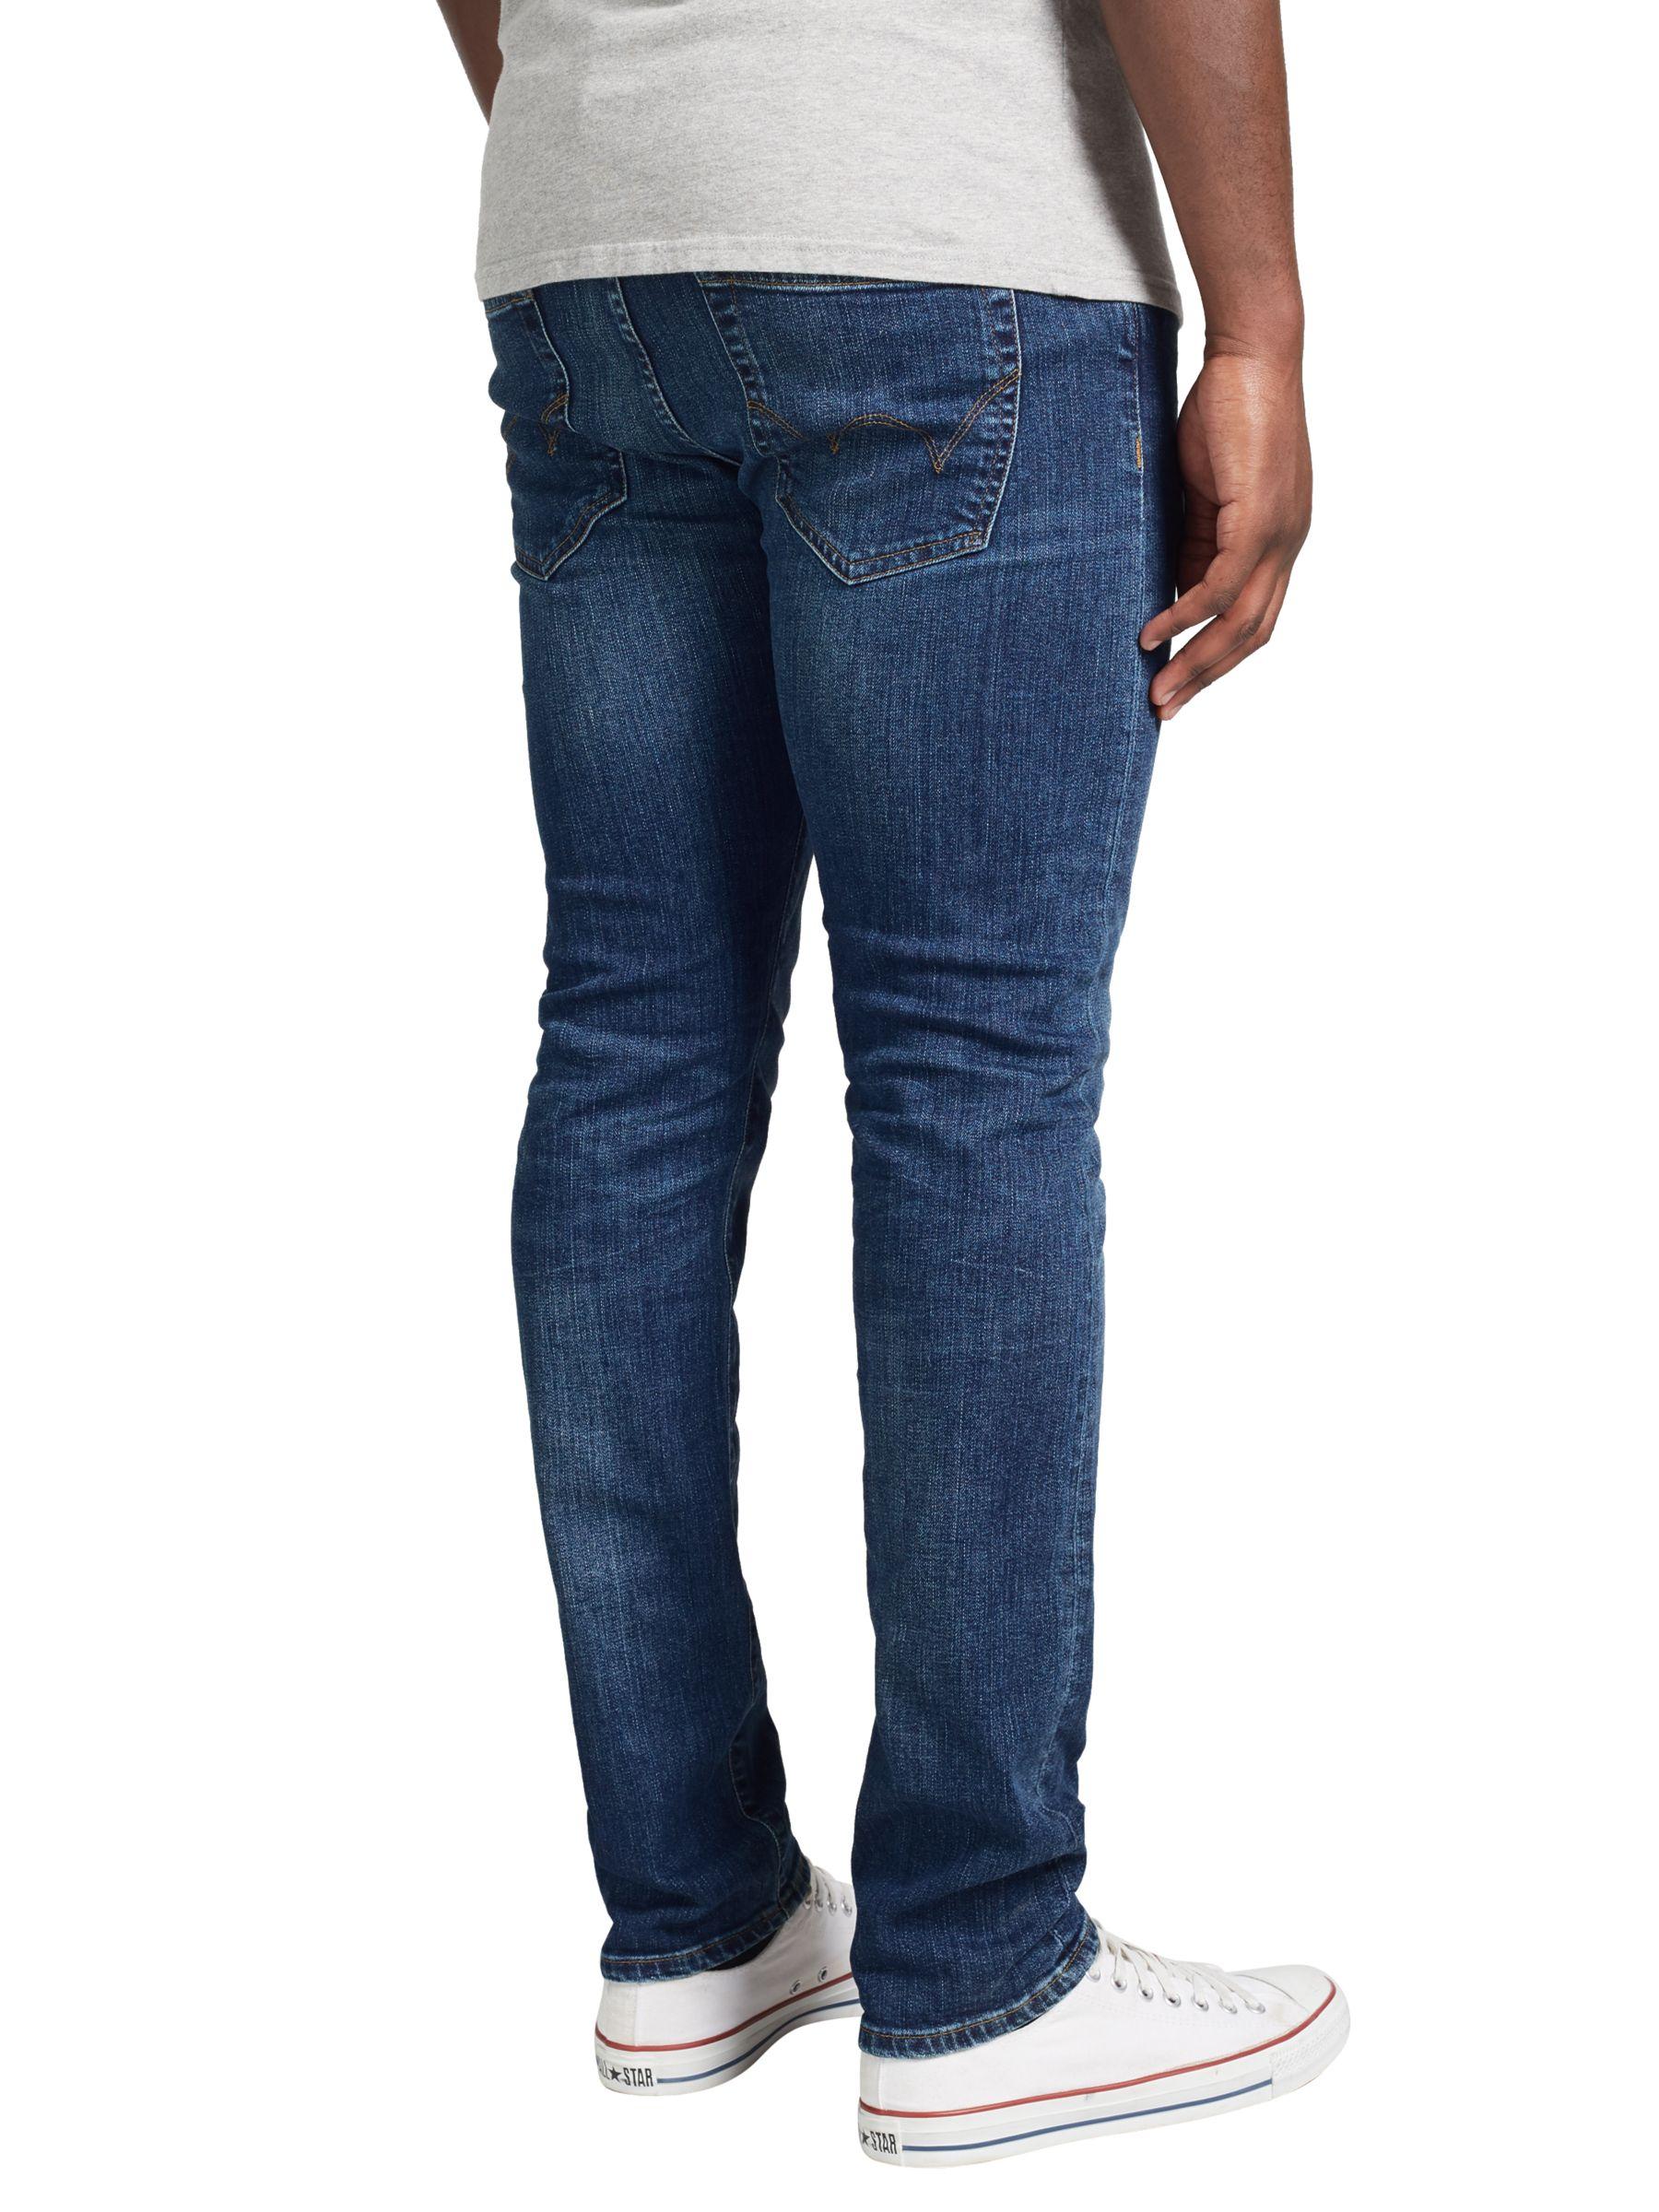 Edwin Edwin ED-80 Slim Tapered Jeans, Night Blue Denim